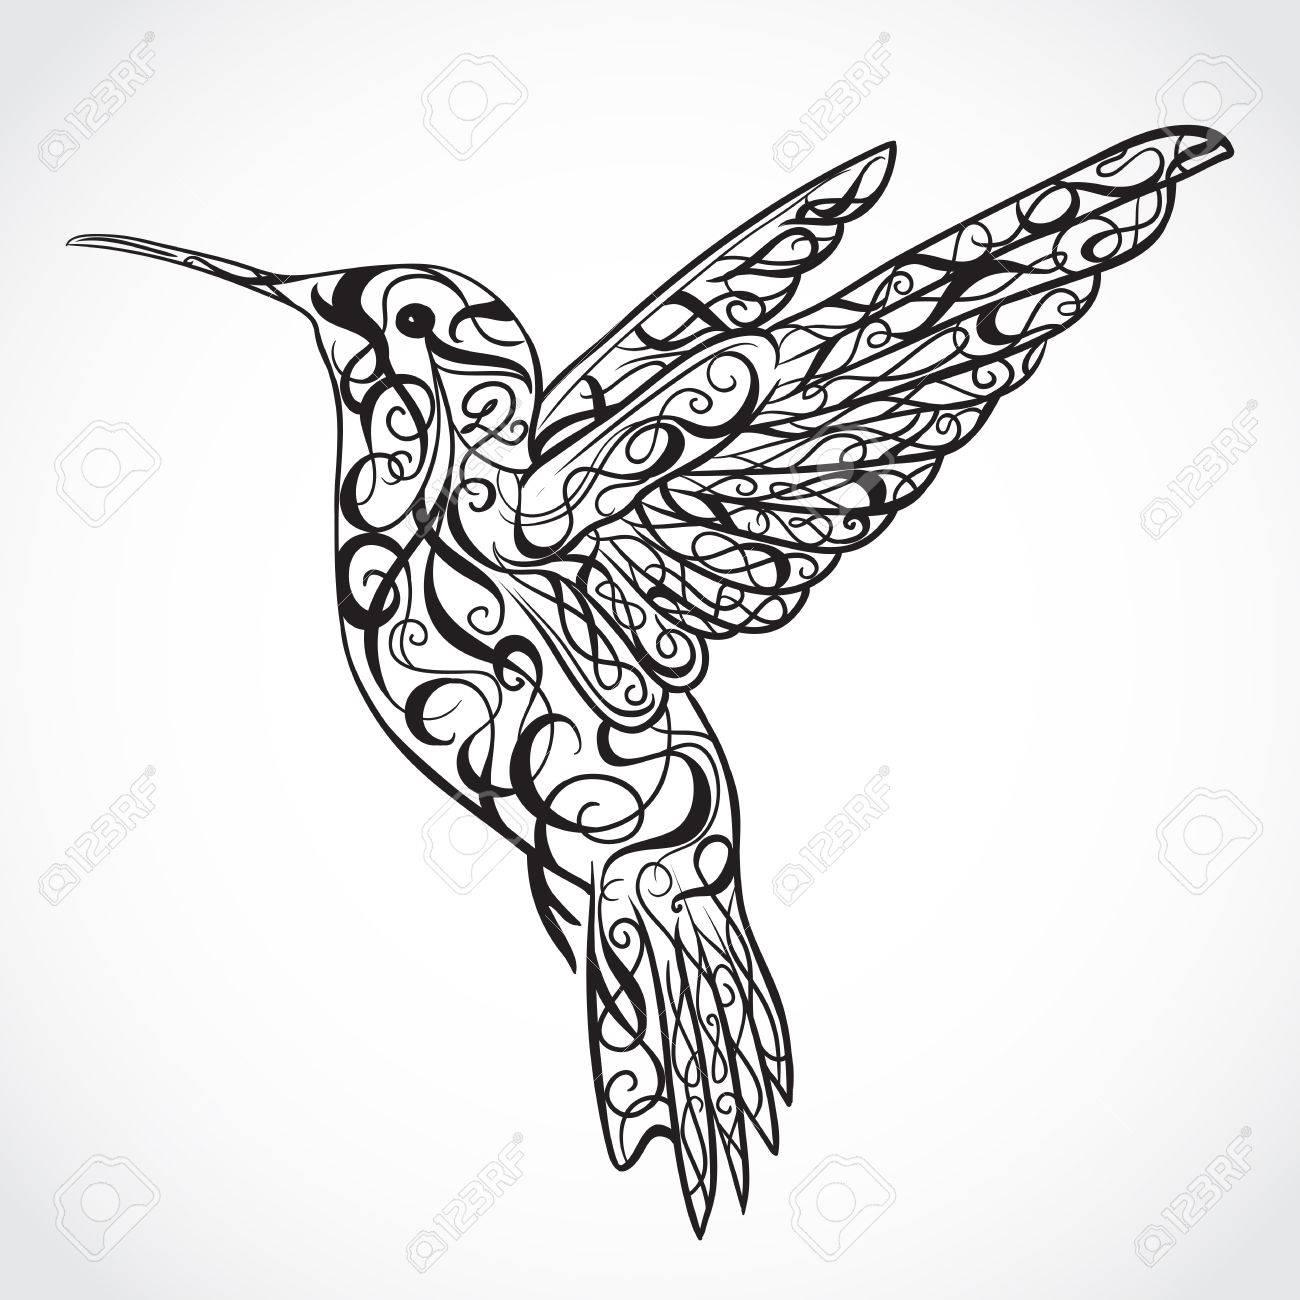 1300x1300 Hummingbird. Tattoo Art. Retro Banner, Invitation, Card, Scrap